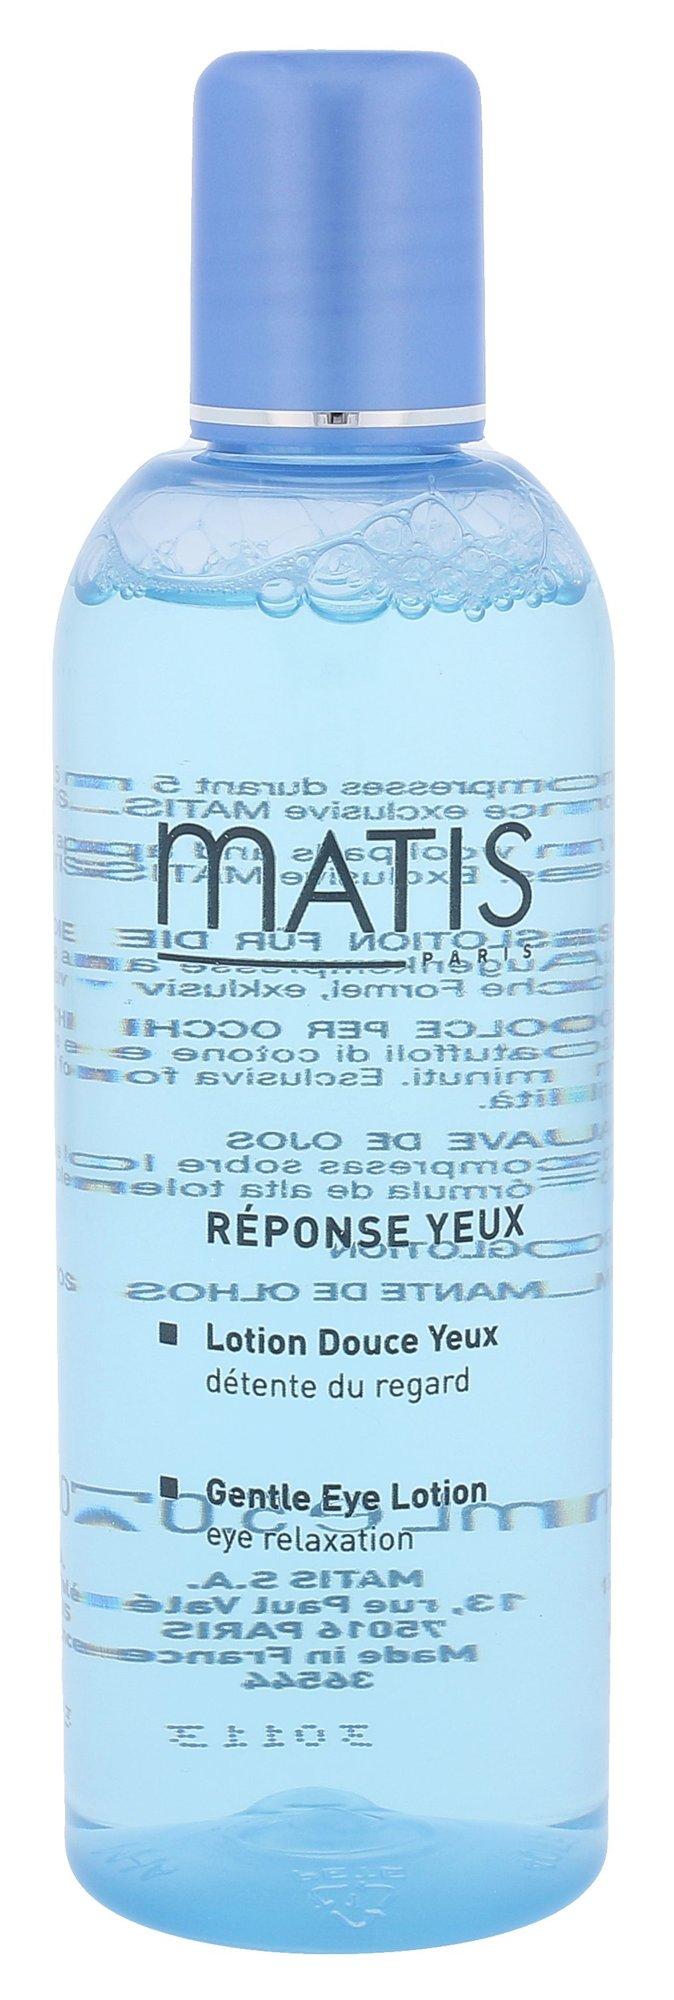 Matis Réponse Yeux Cosmetic 200ml  Gentle Eye Lotion